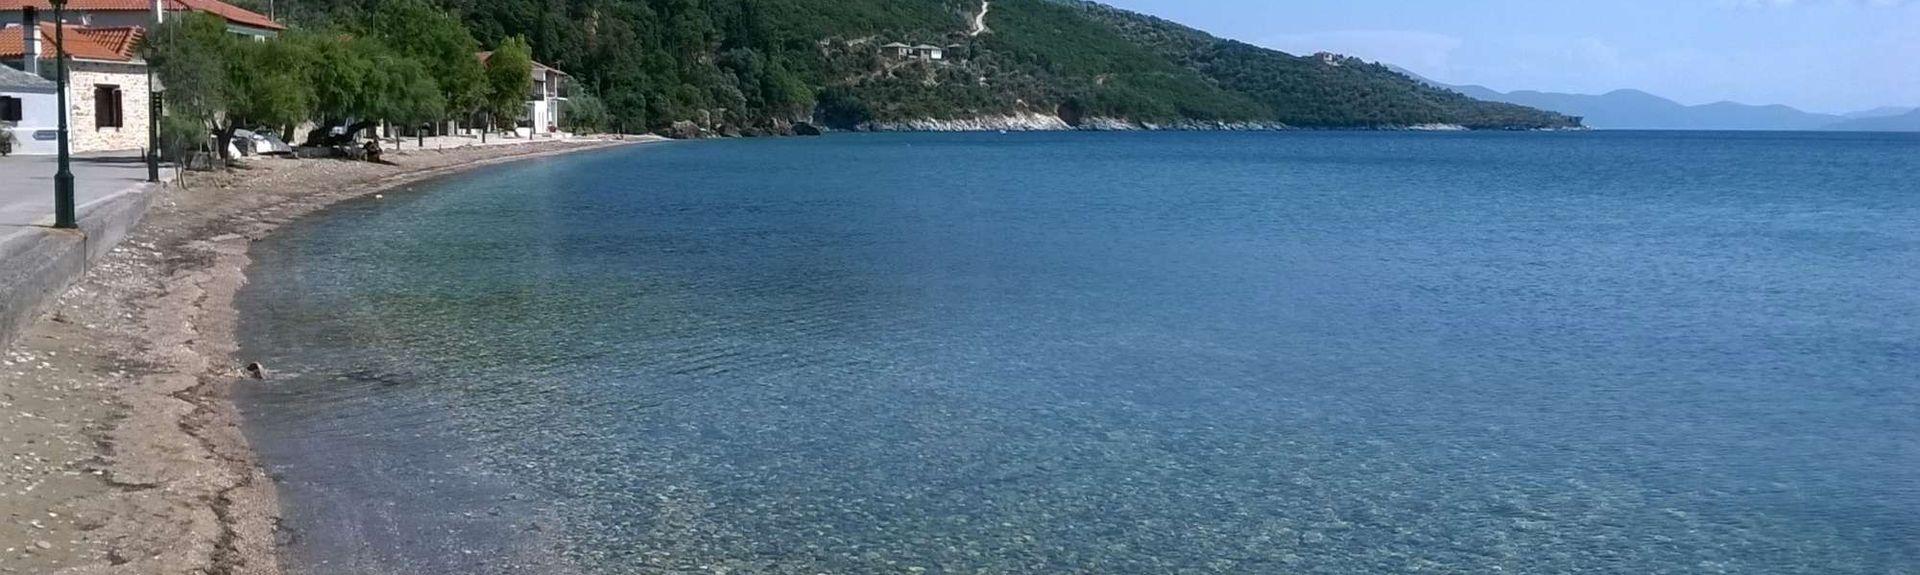 Skiathoksen satama, Skiathos, Thessalia Sterea Ellada, Kreikka